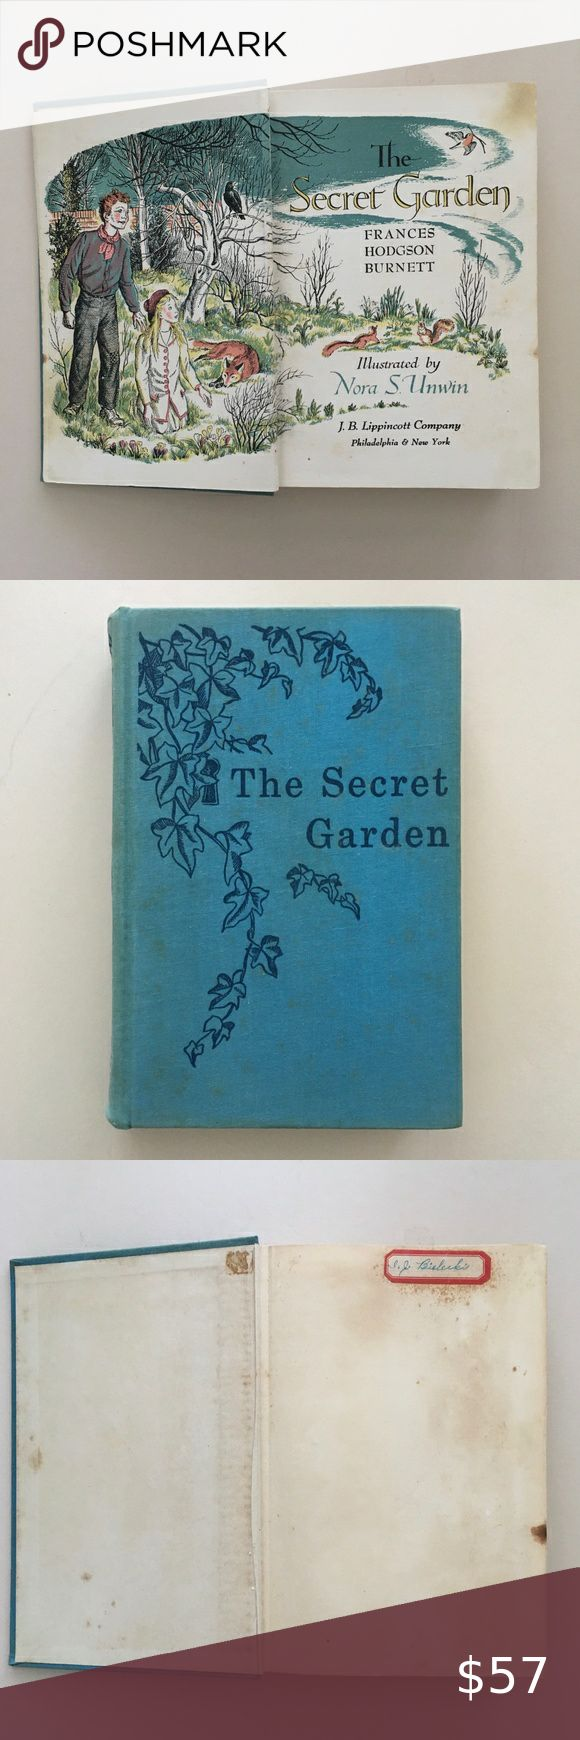 Rare Book 1938 The Secret Garden in 2020 Rare books